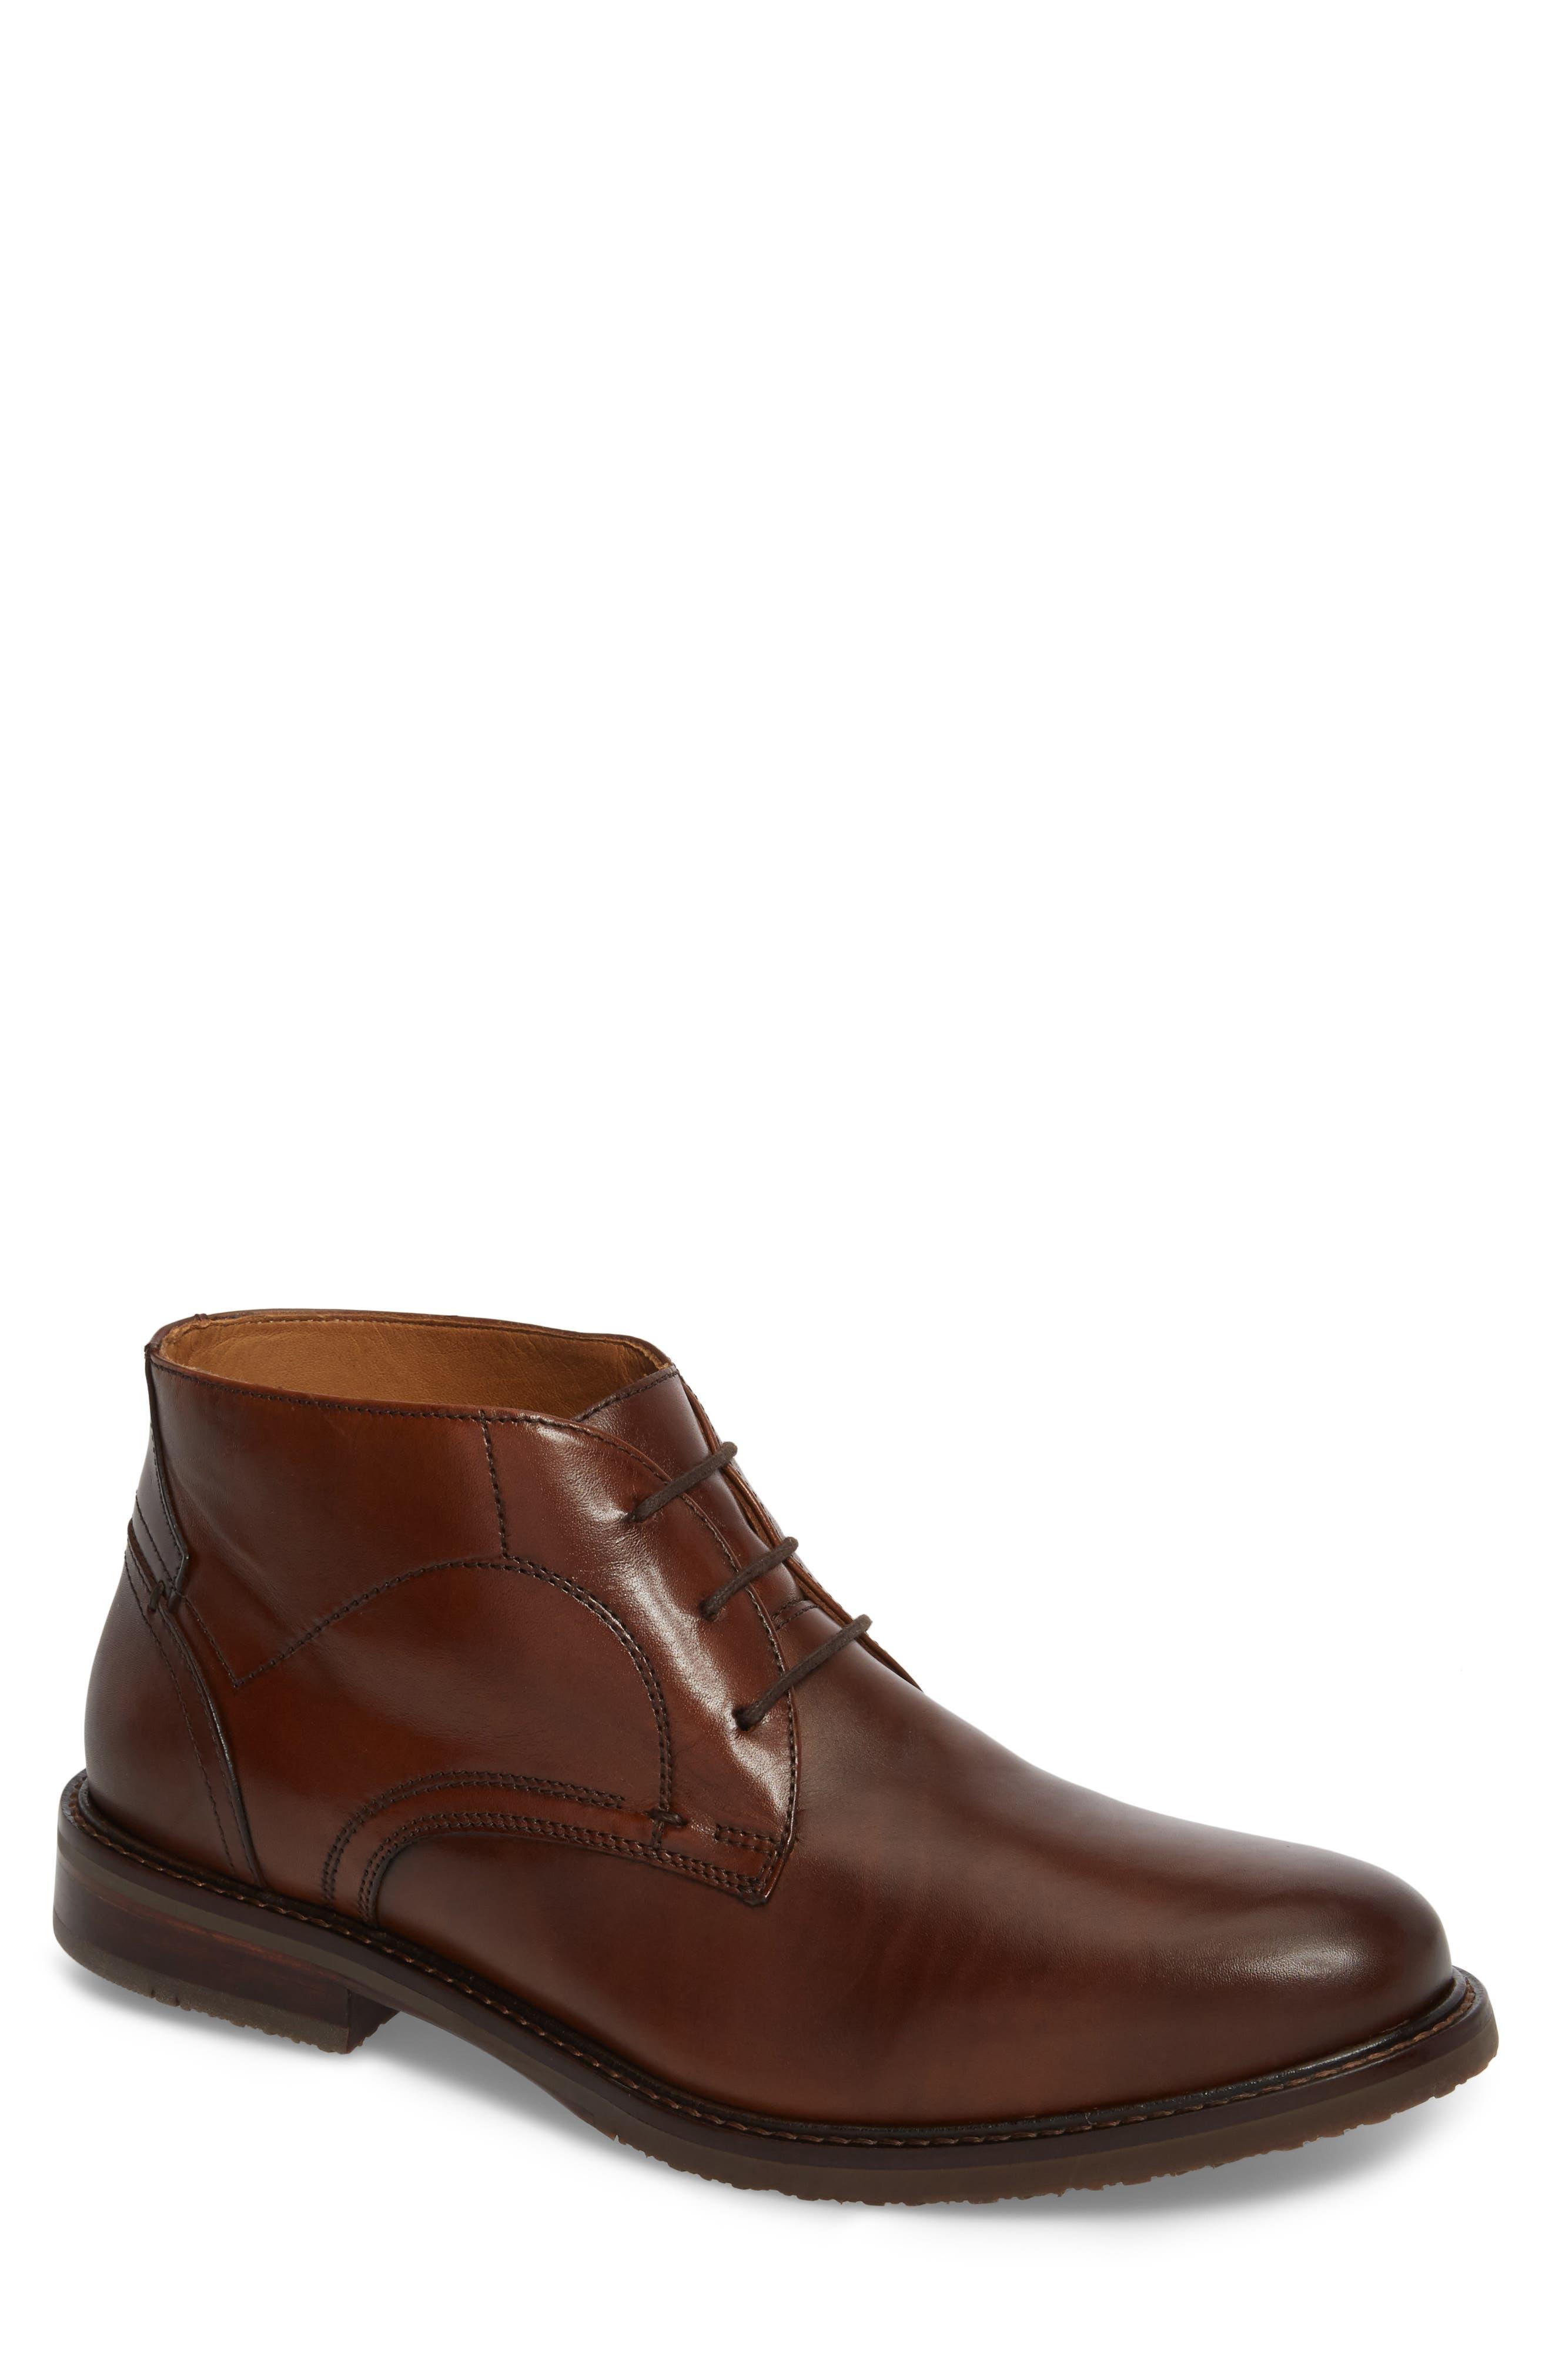 Ramsey Chukka Boot,                         Main,                         color, TAN